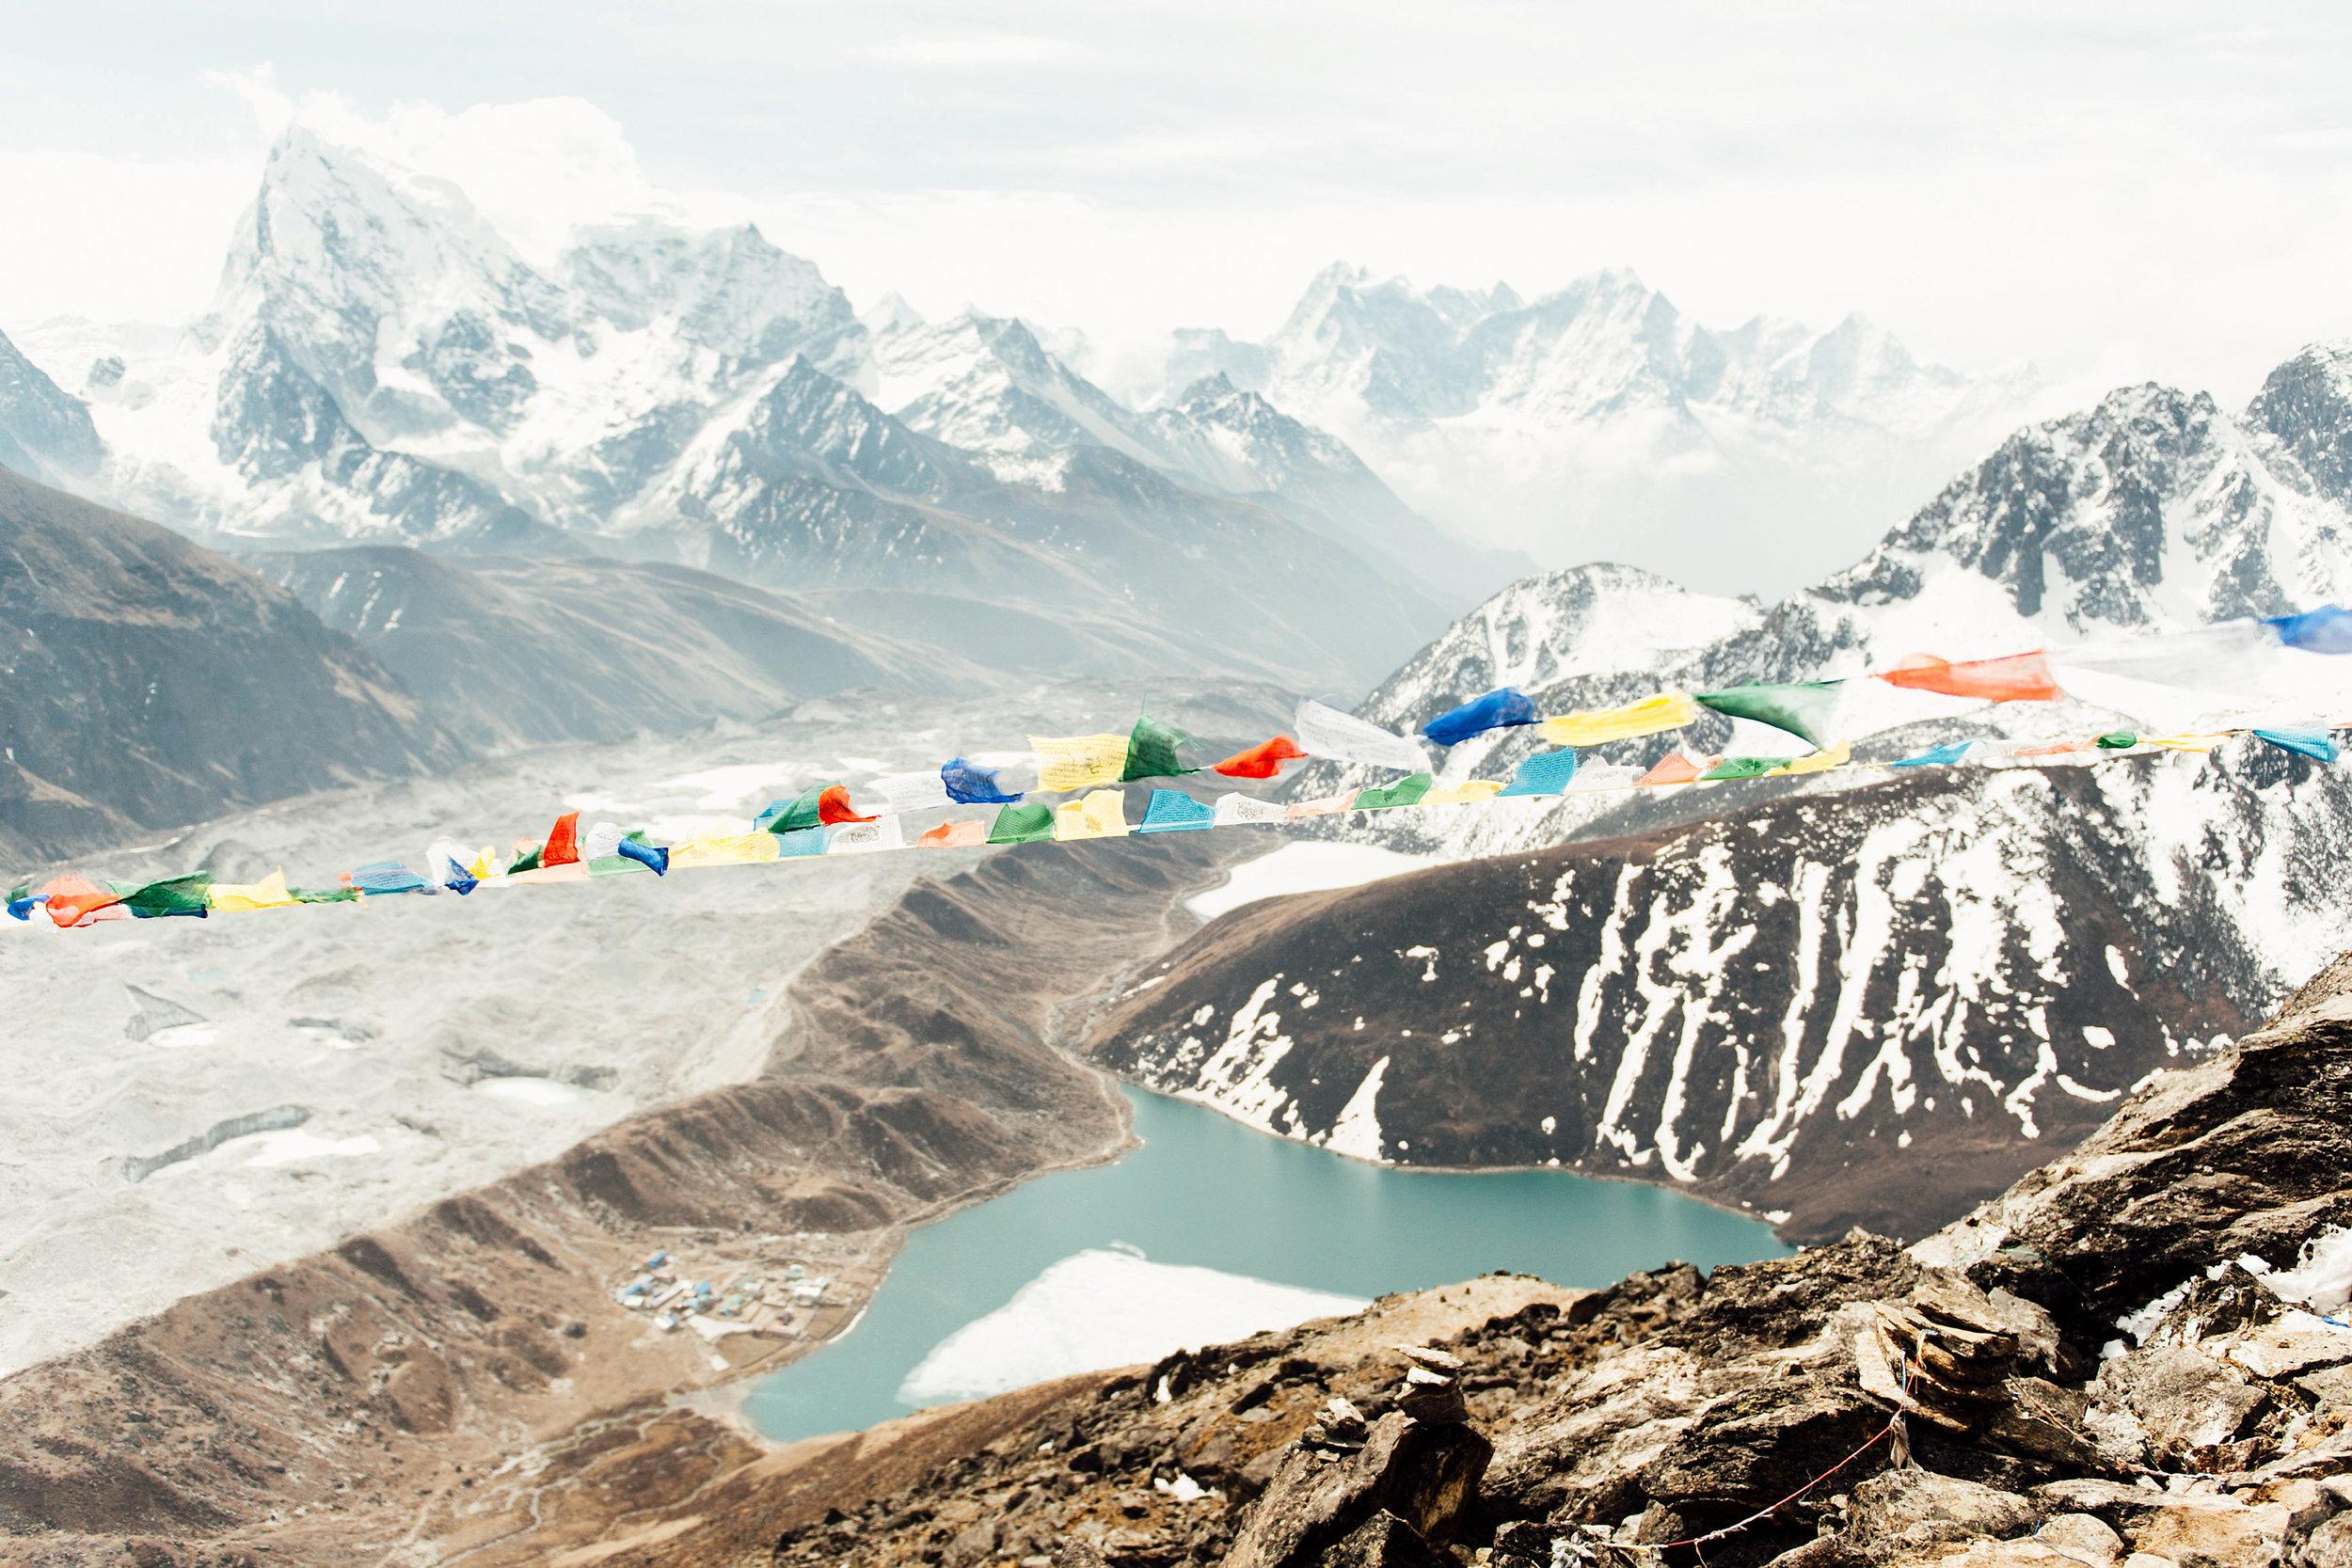 Katie_Mitchell_Photography_India_Mongolia_Worldwide_Travel_Photographer_05.jpg